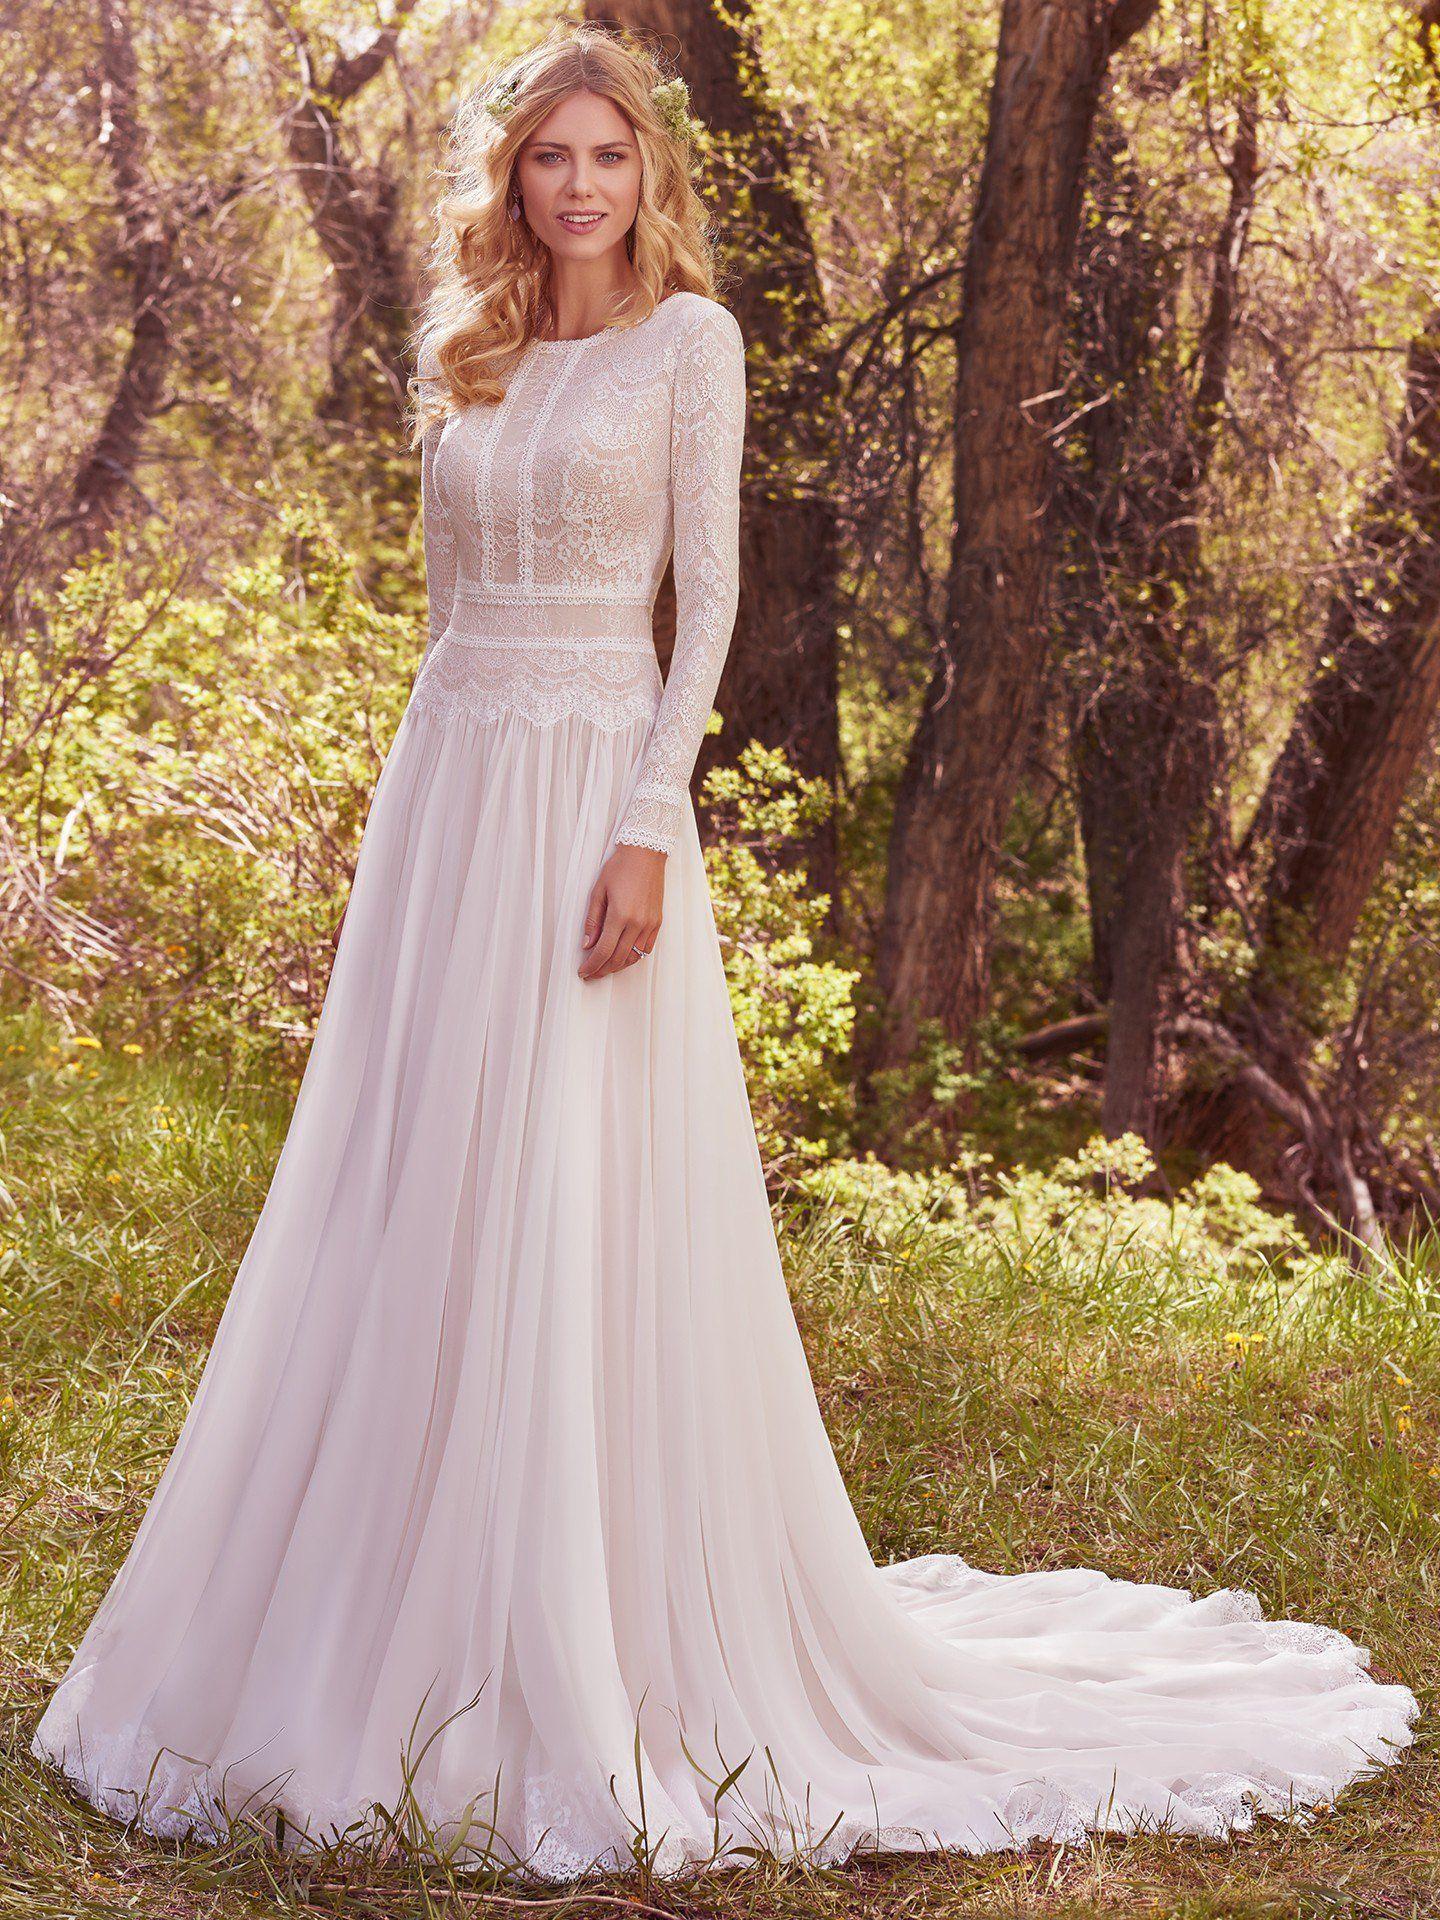 Maggie Sottero Wedding Dresses Maggie sottero, Wedding